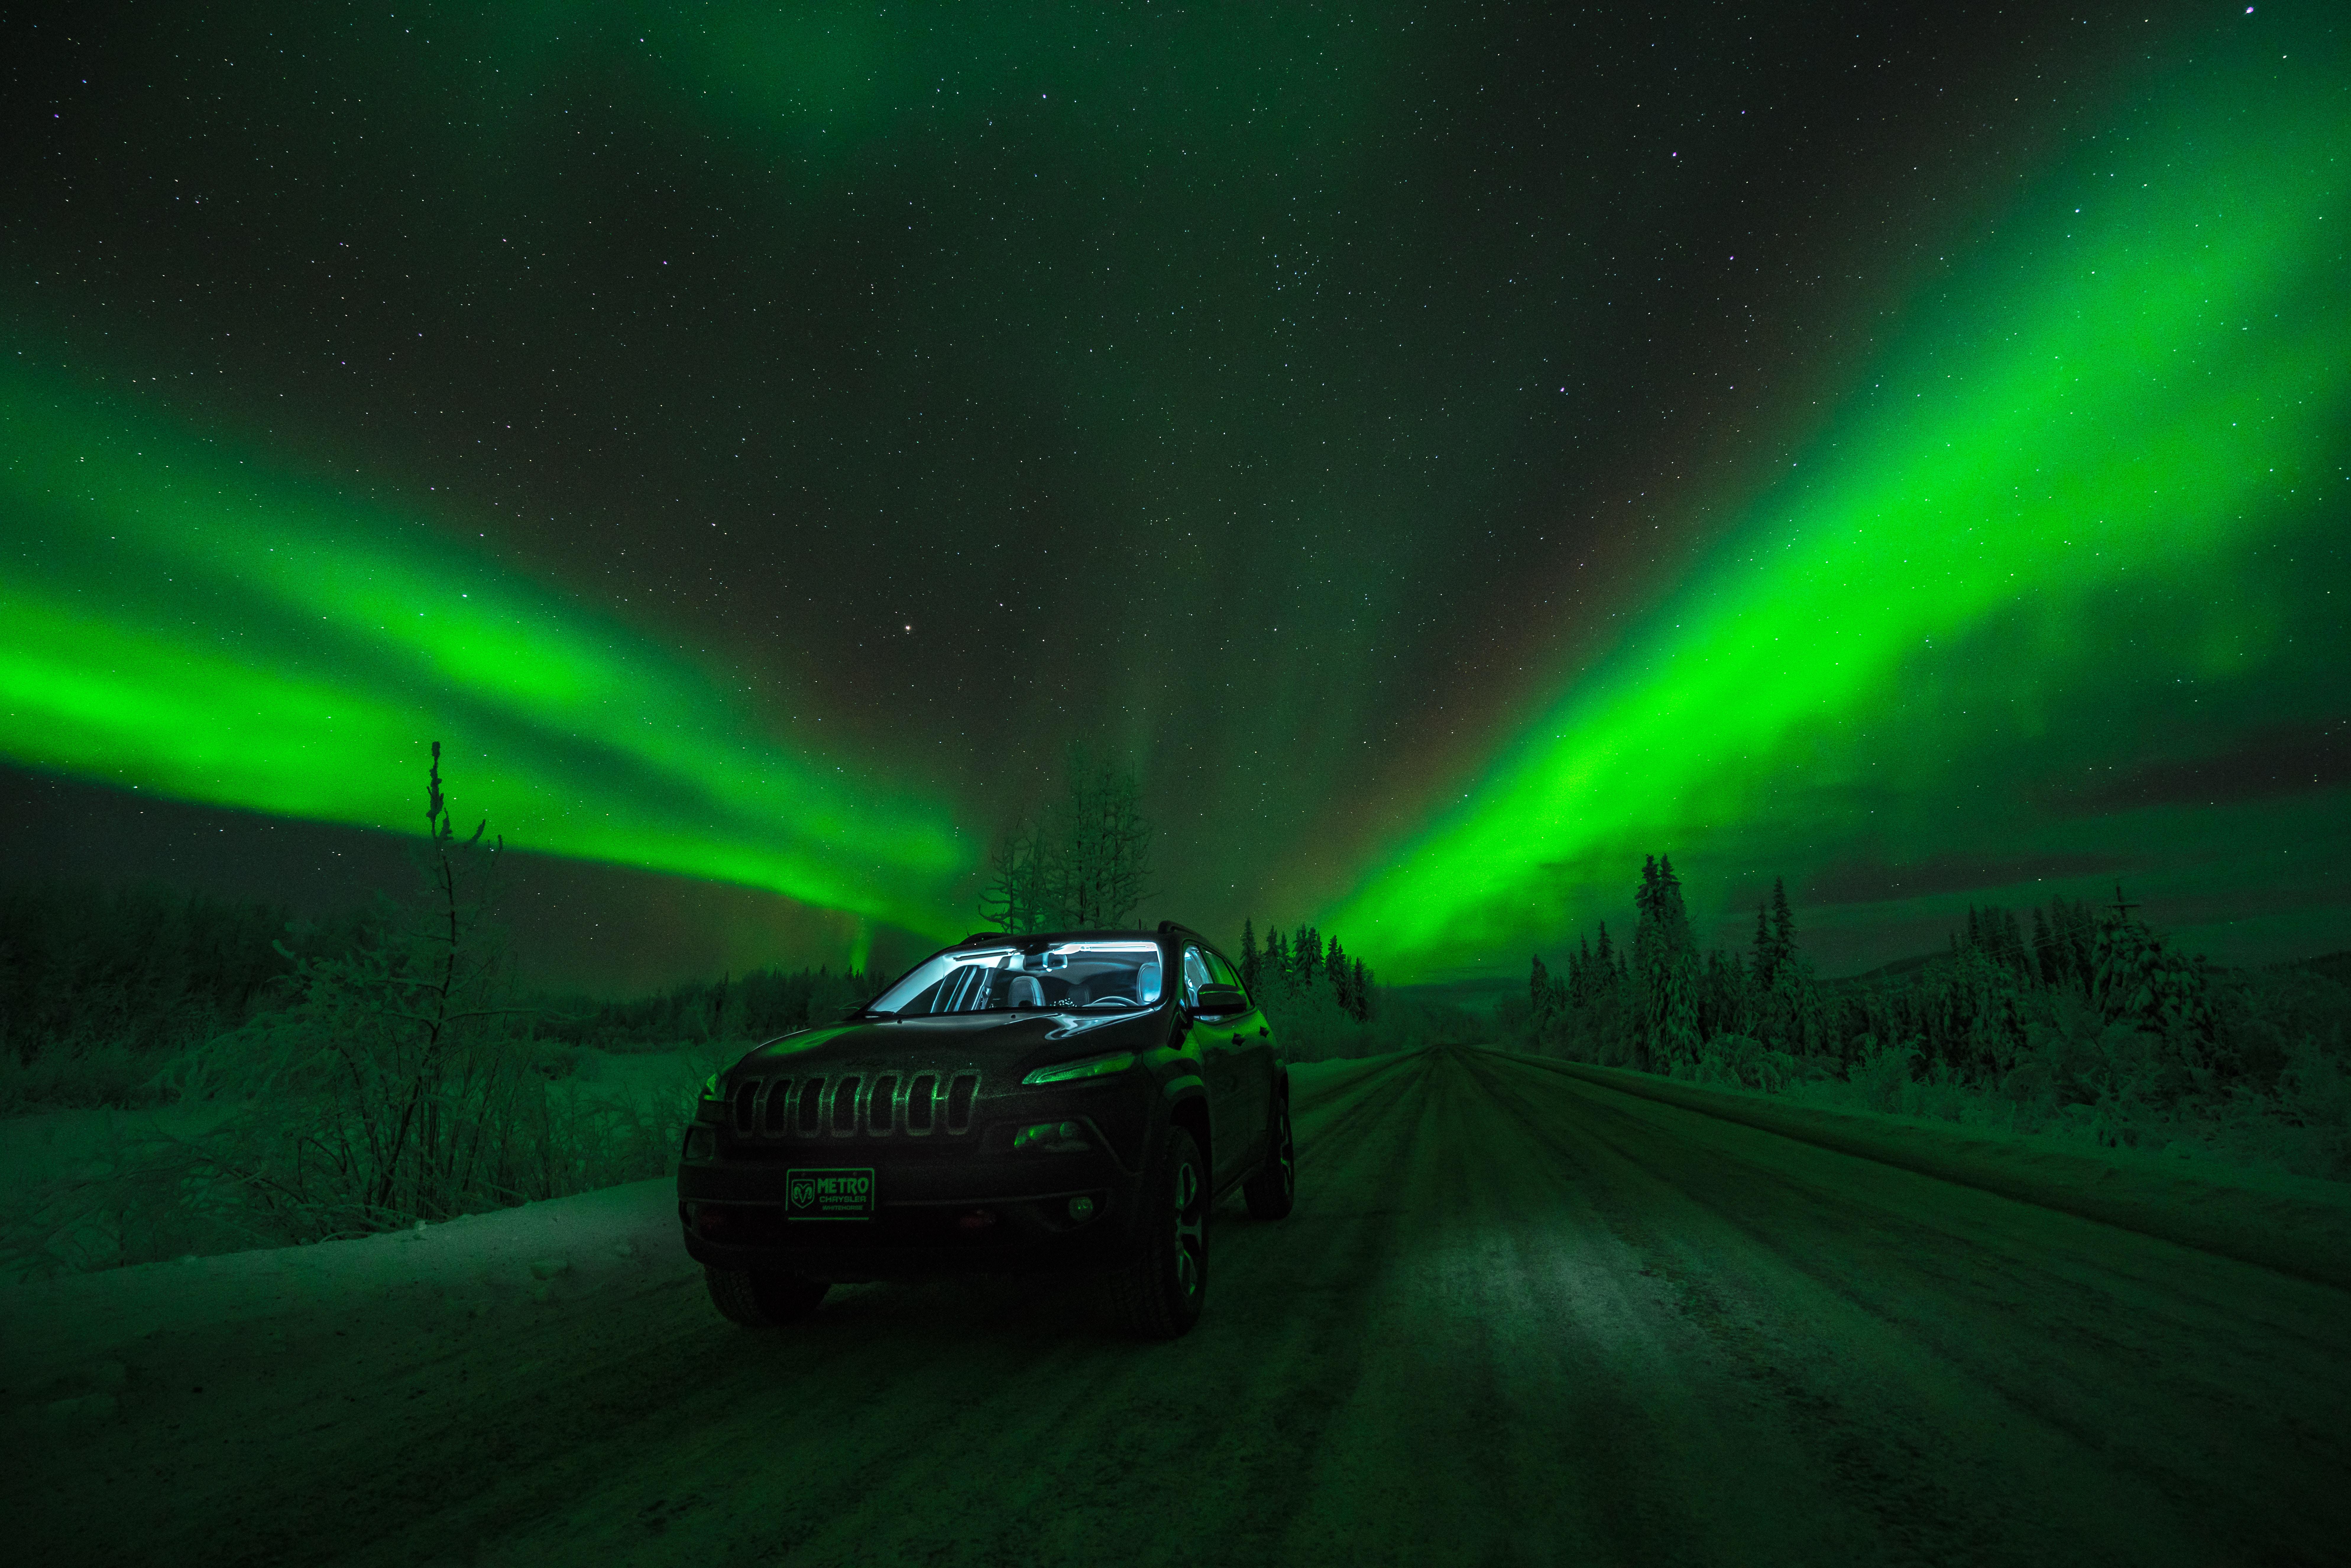 black car on road under Aurora Borealis